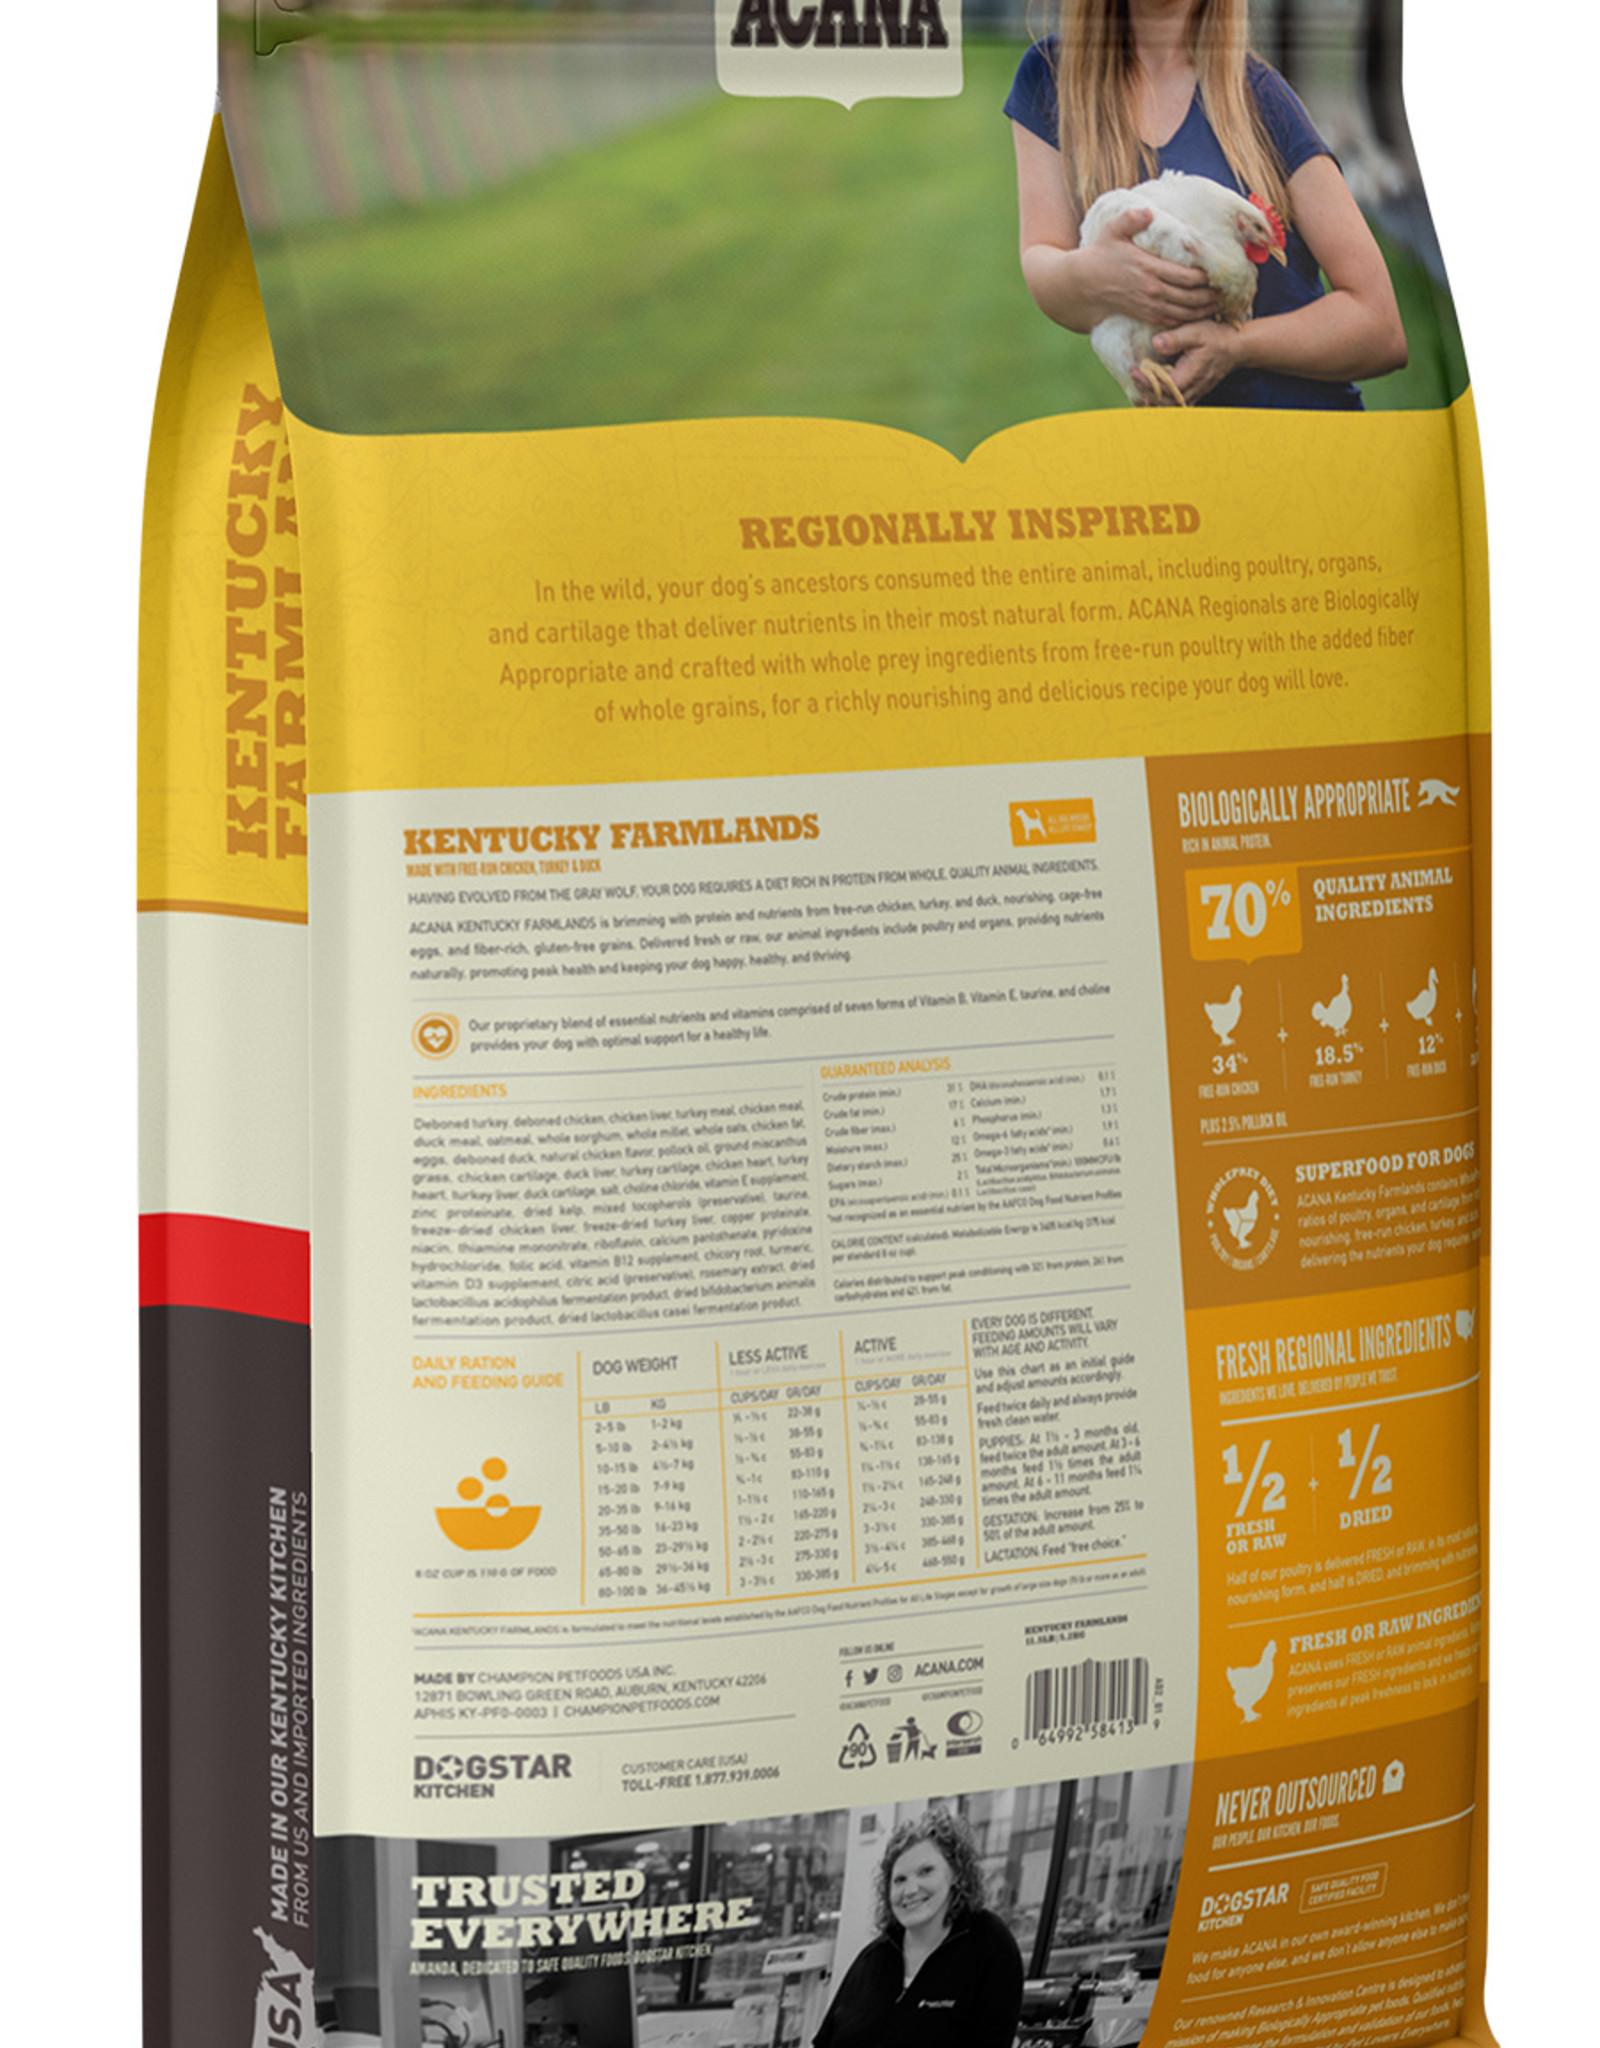 CHAMPION PET FOOD ACANA KENTUCKY FARMLANDS WHOLESOME GRAINS 22.5LBS